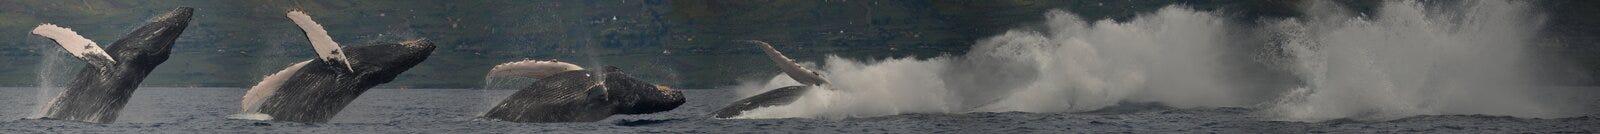 Panorama Of Humpback Whale Breaching stock photos